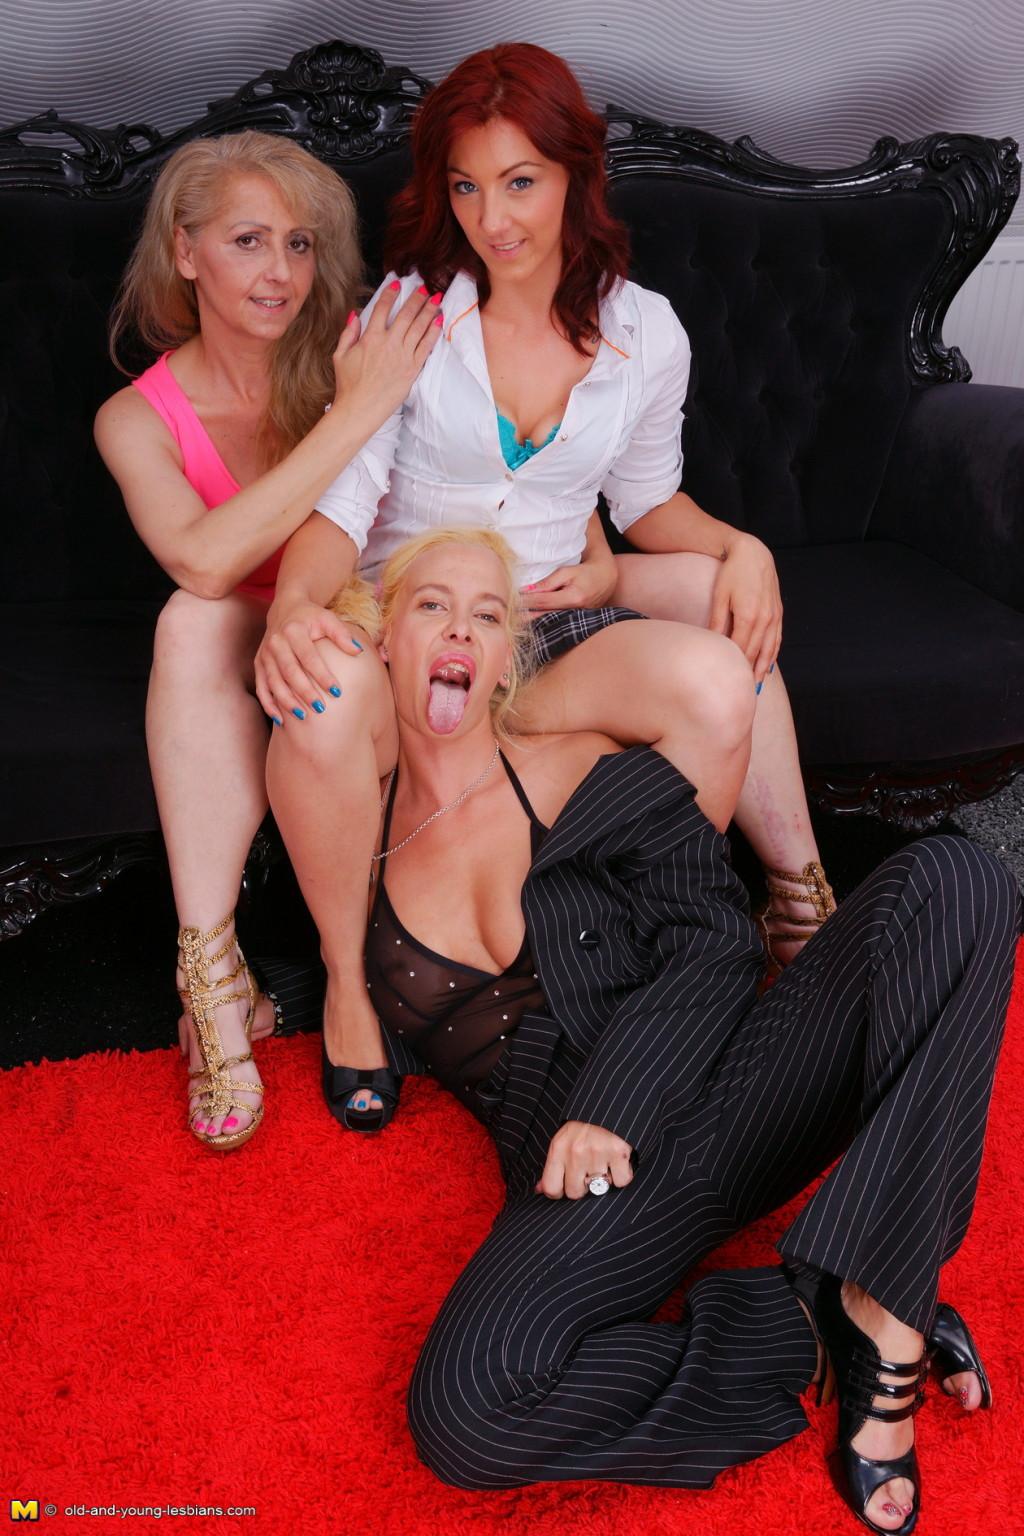 Lesbian Threesome Anal Strap